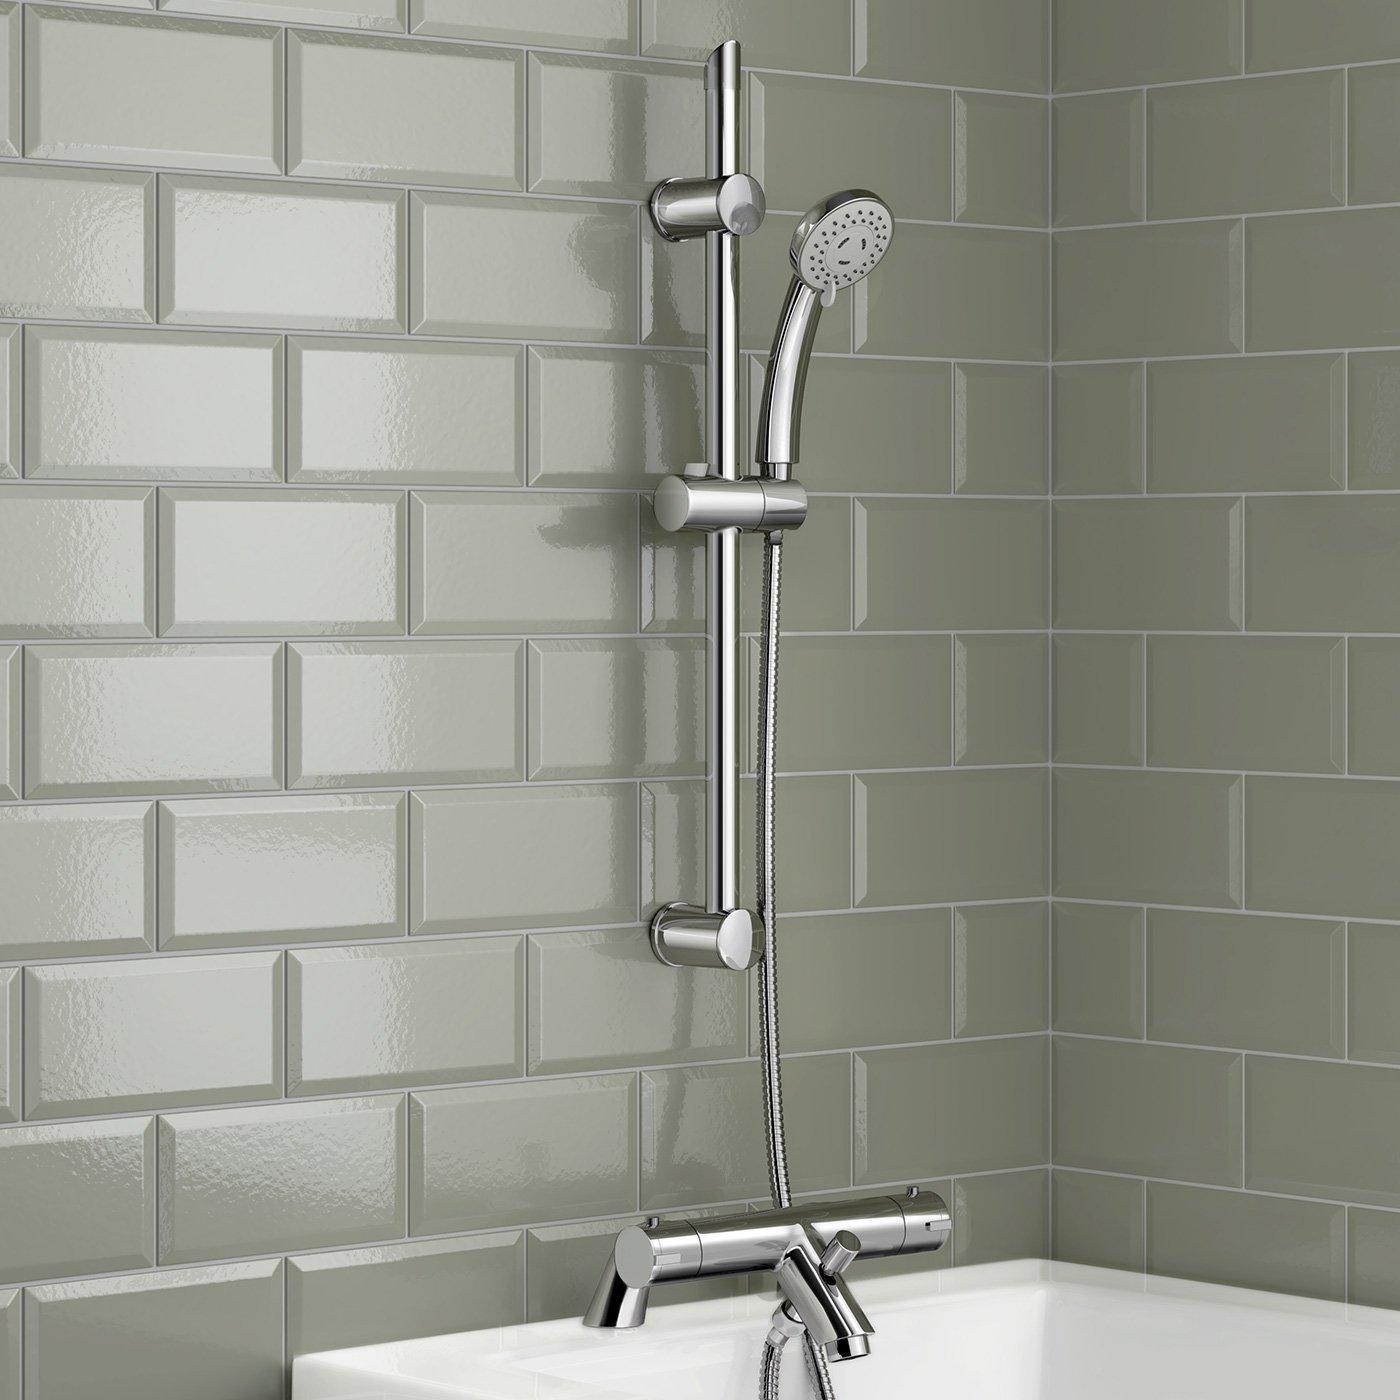 Columna de ducha de iBathUK con grifo mezclador termostático ...